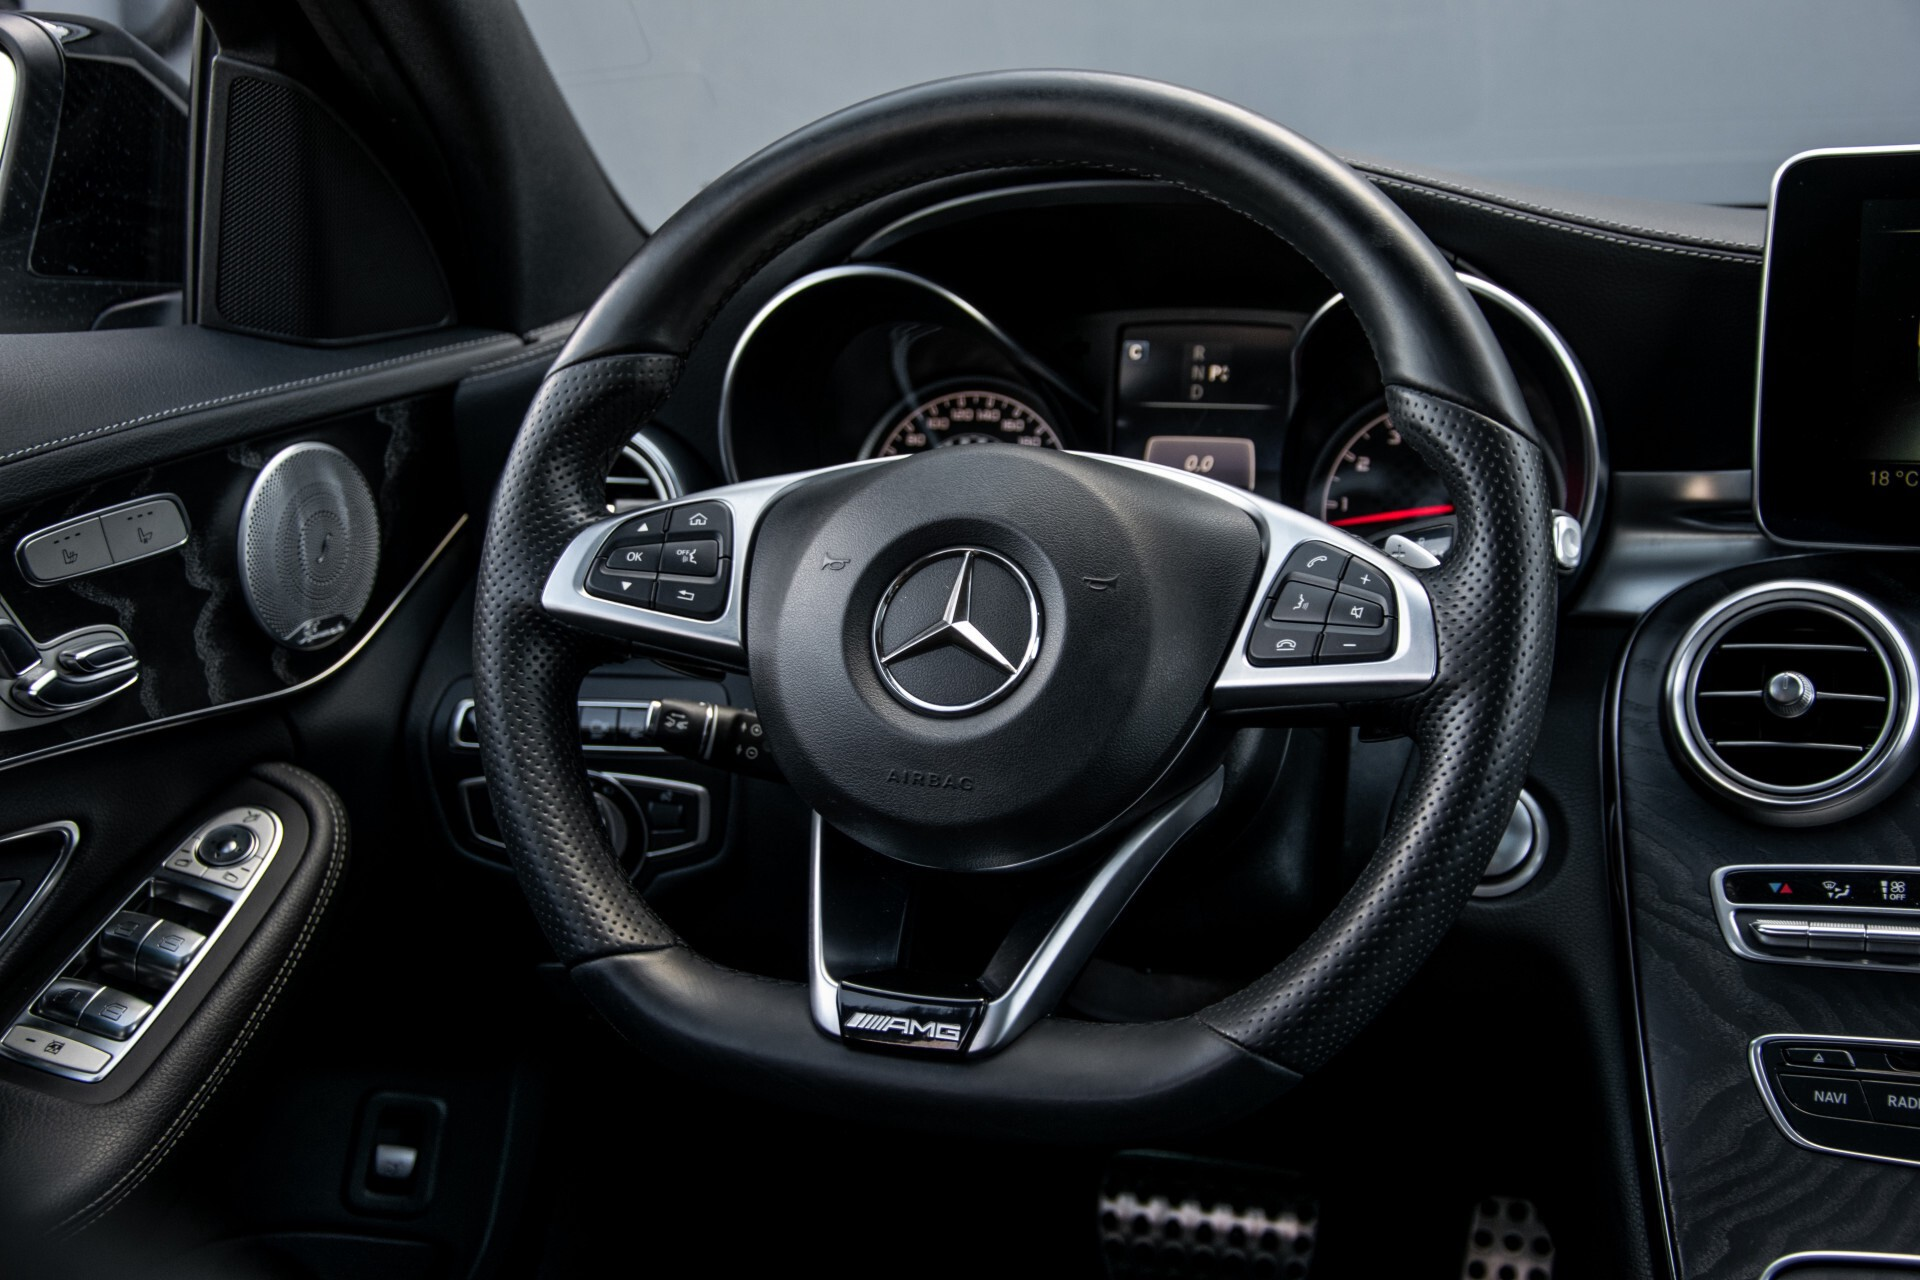 Mercedes-Benz C-Klasse 450/43 AMG 4-M Distronic/Standkachel/Panorama/Keyless/Harman-Kardon/Stoelkoeling Aut7 Foto 7